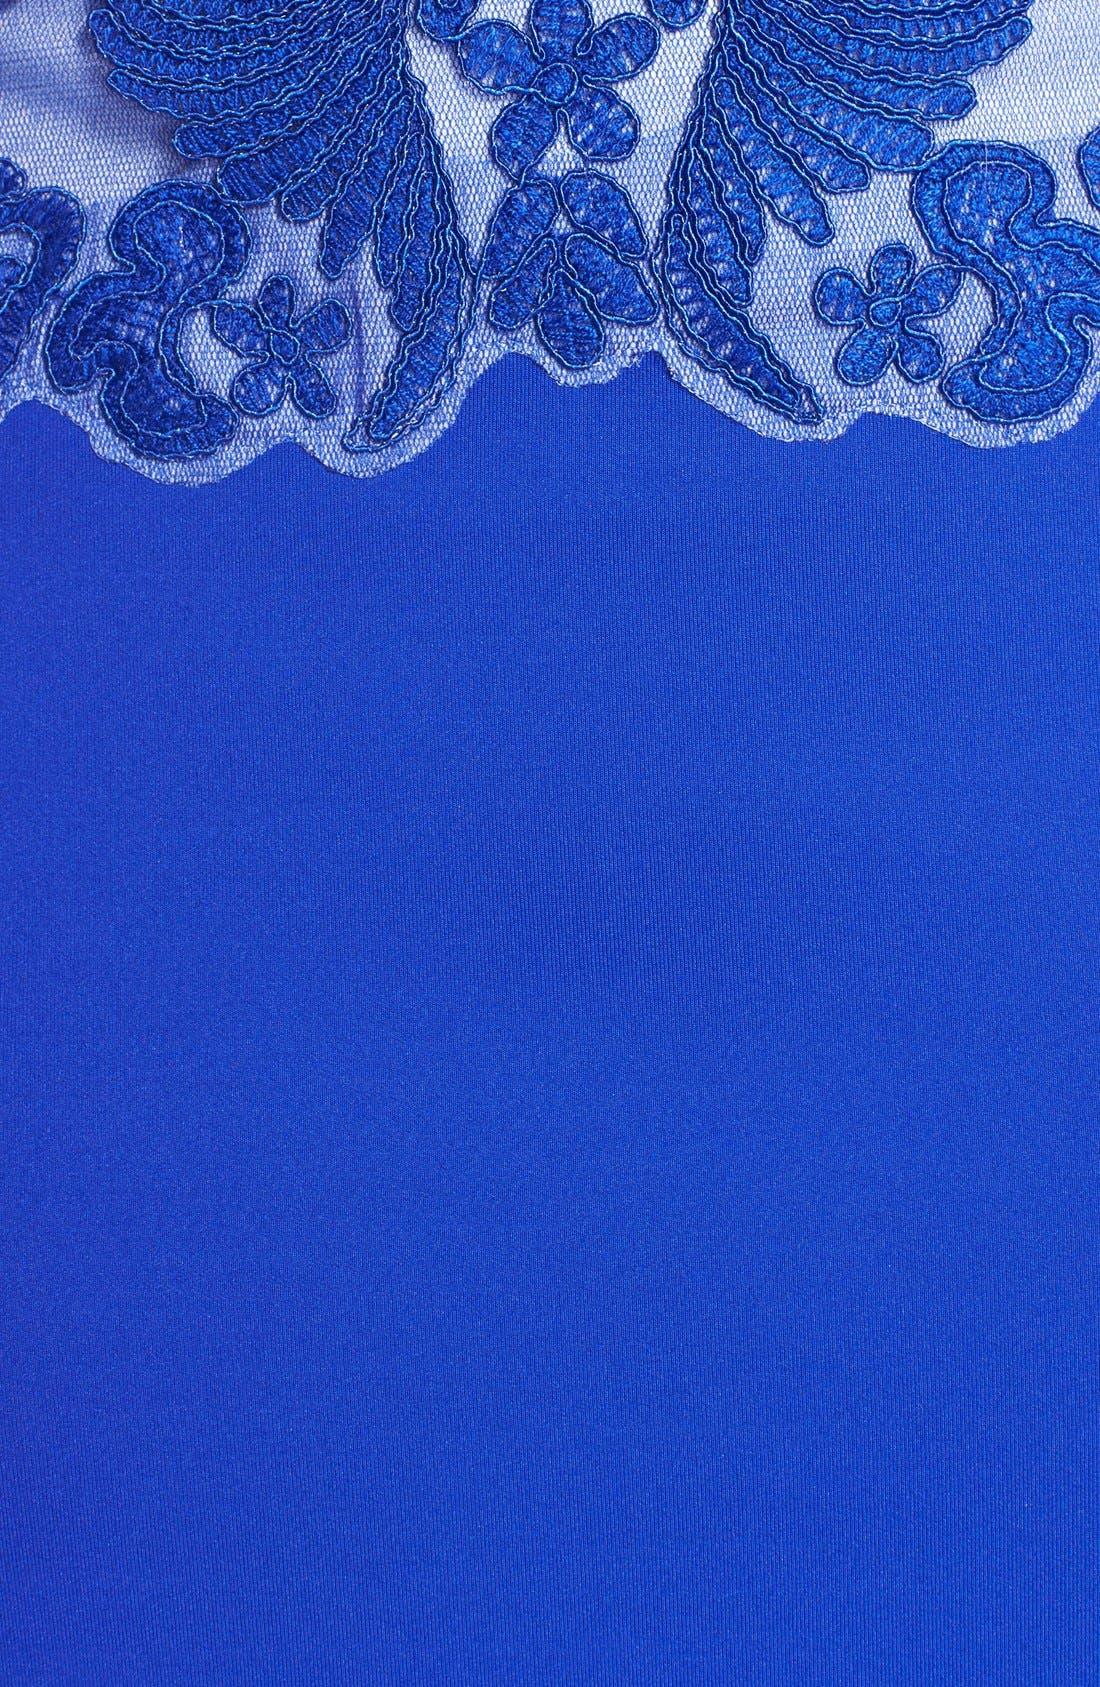 Alternate Image 4  - Tadashi Shoji Belted Embroidered Neoprene Sheath Dress (Regular & Petite)